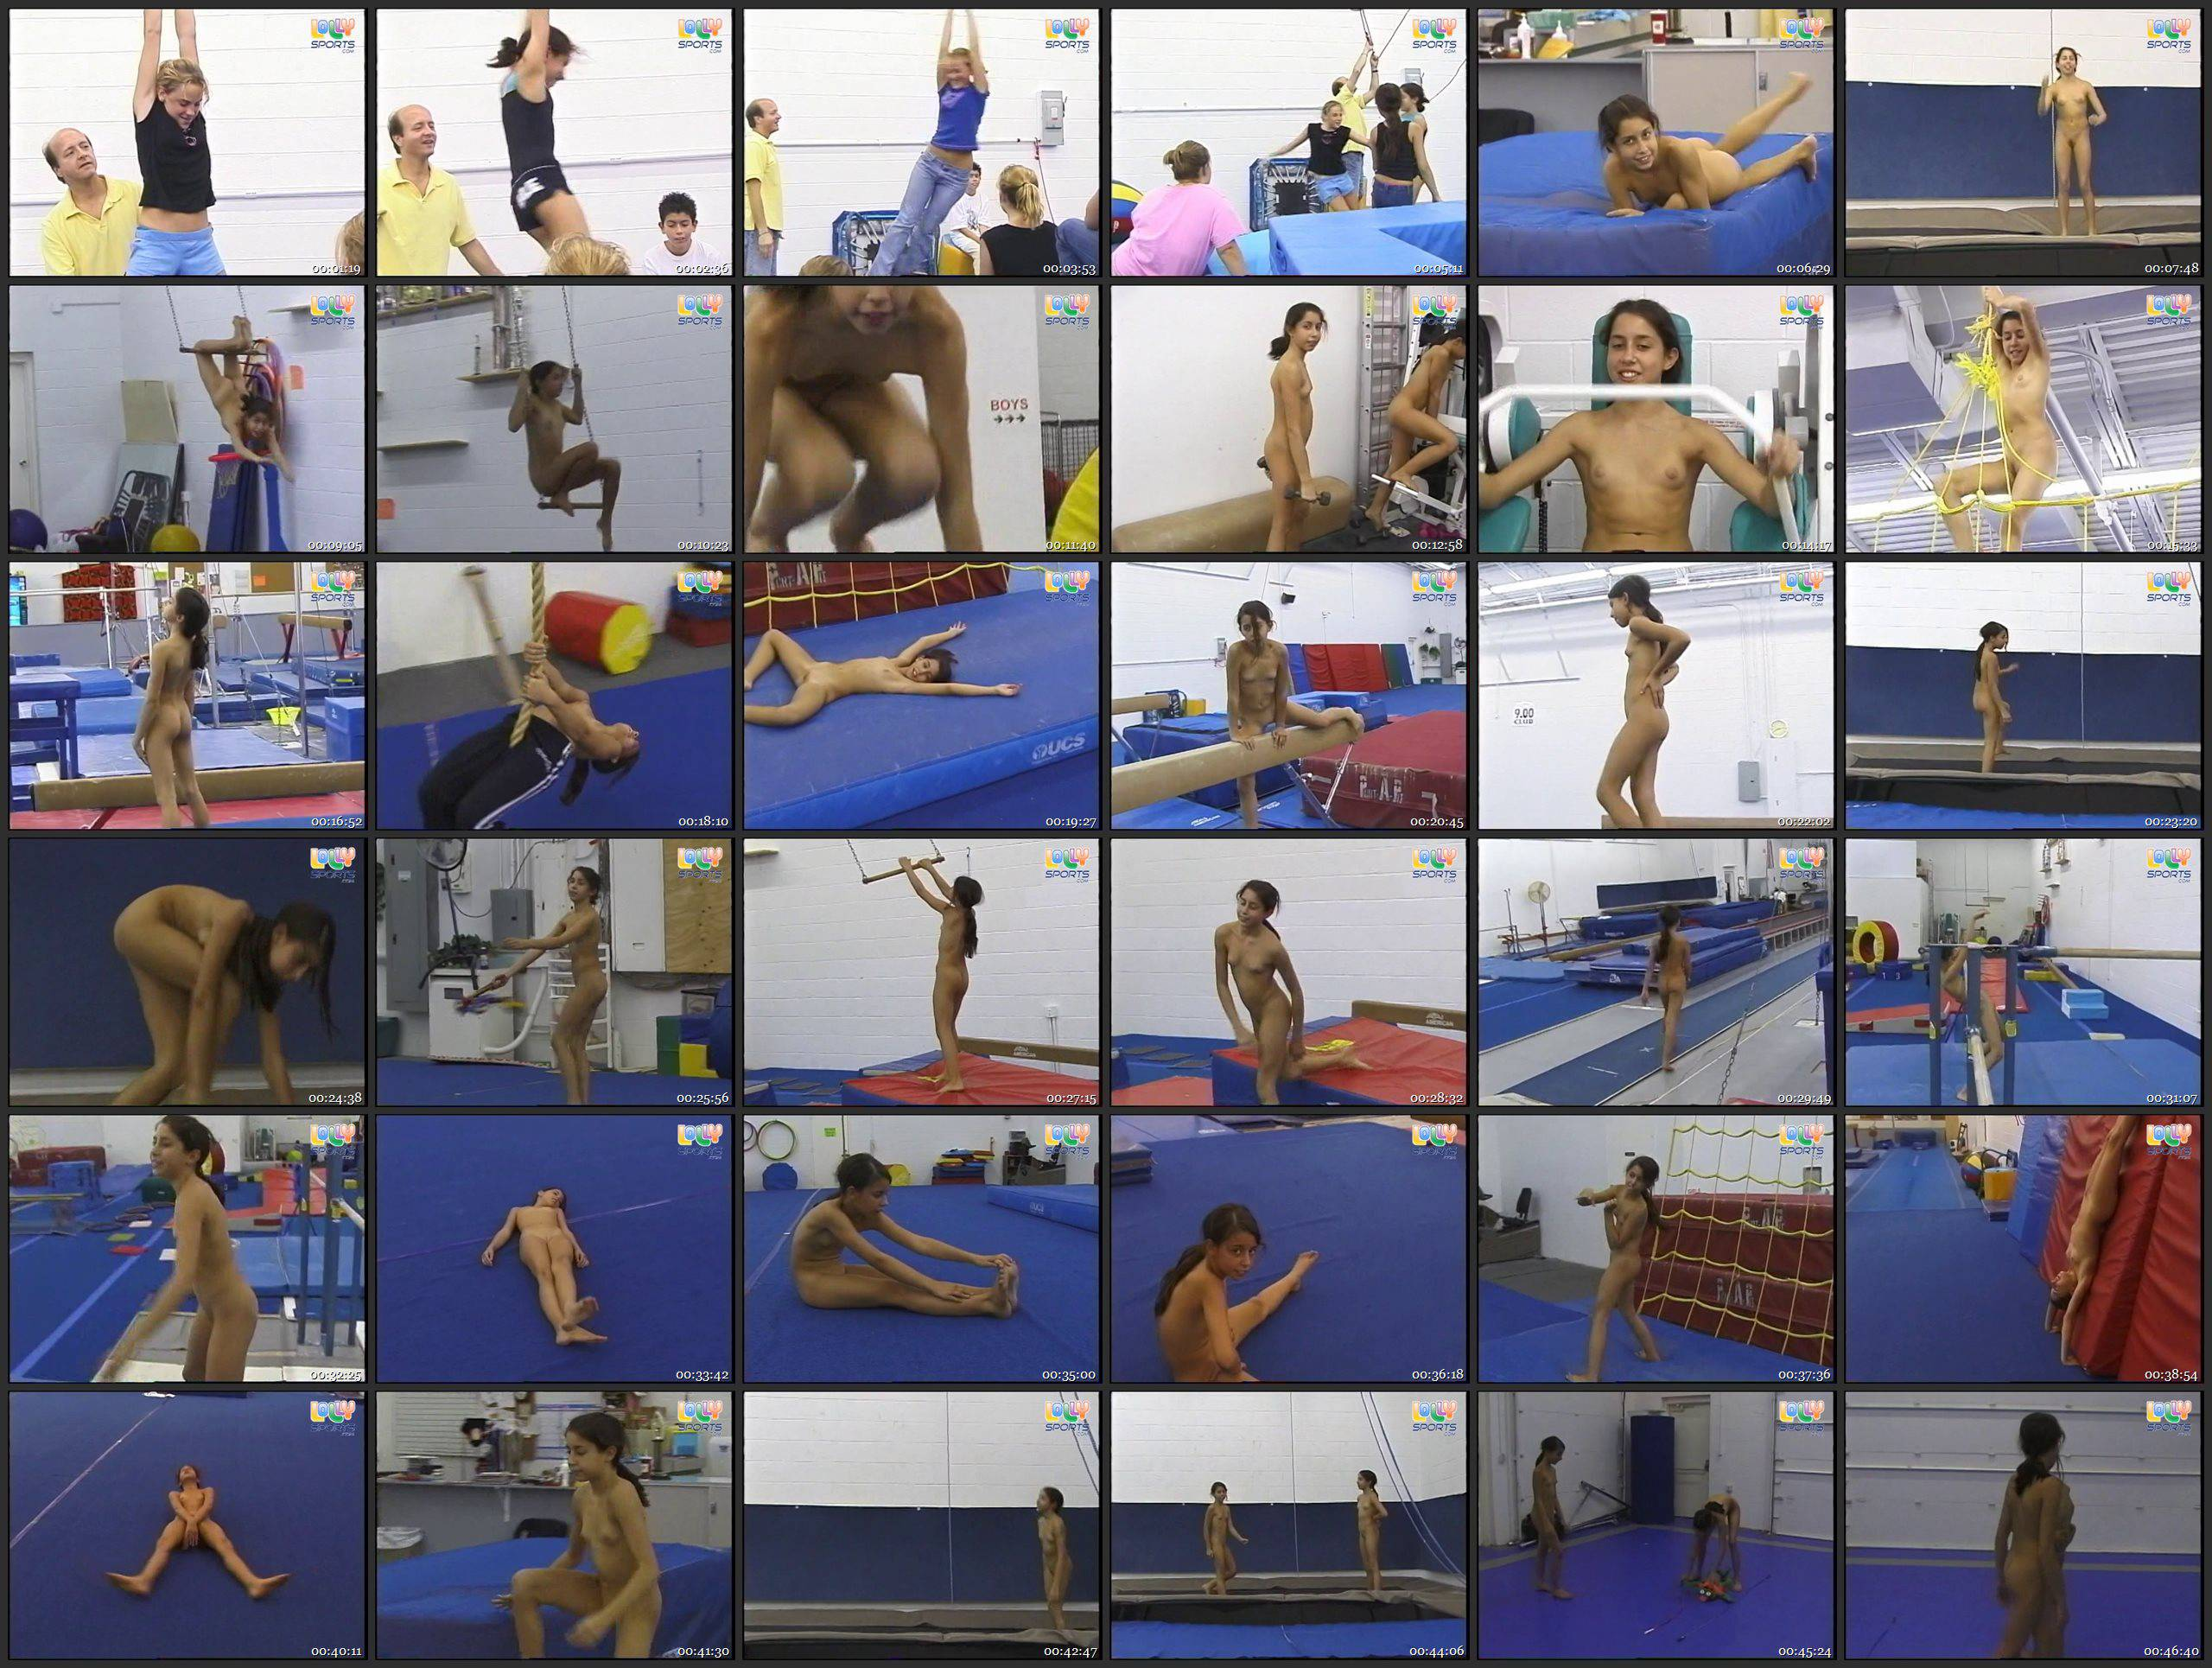 FKK Videos-Kasey and October Nude Gymnasts (LollySports.com) - Thumbnails